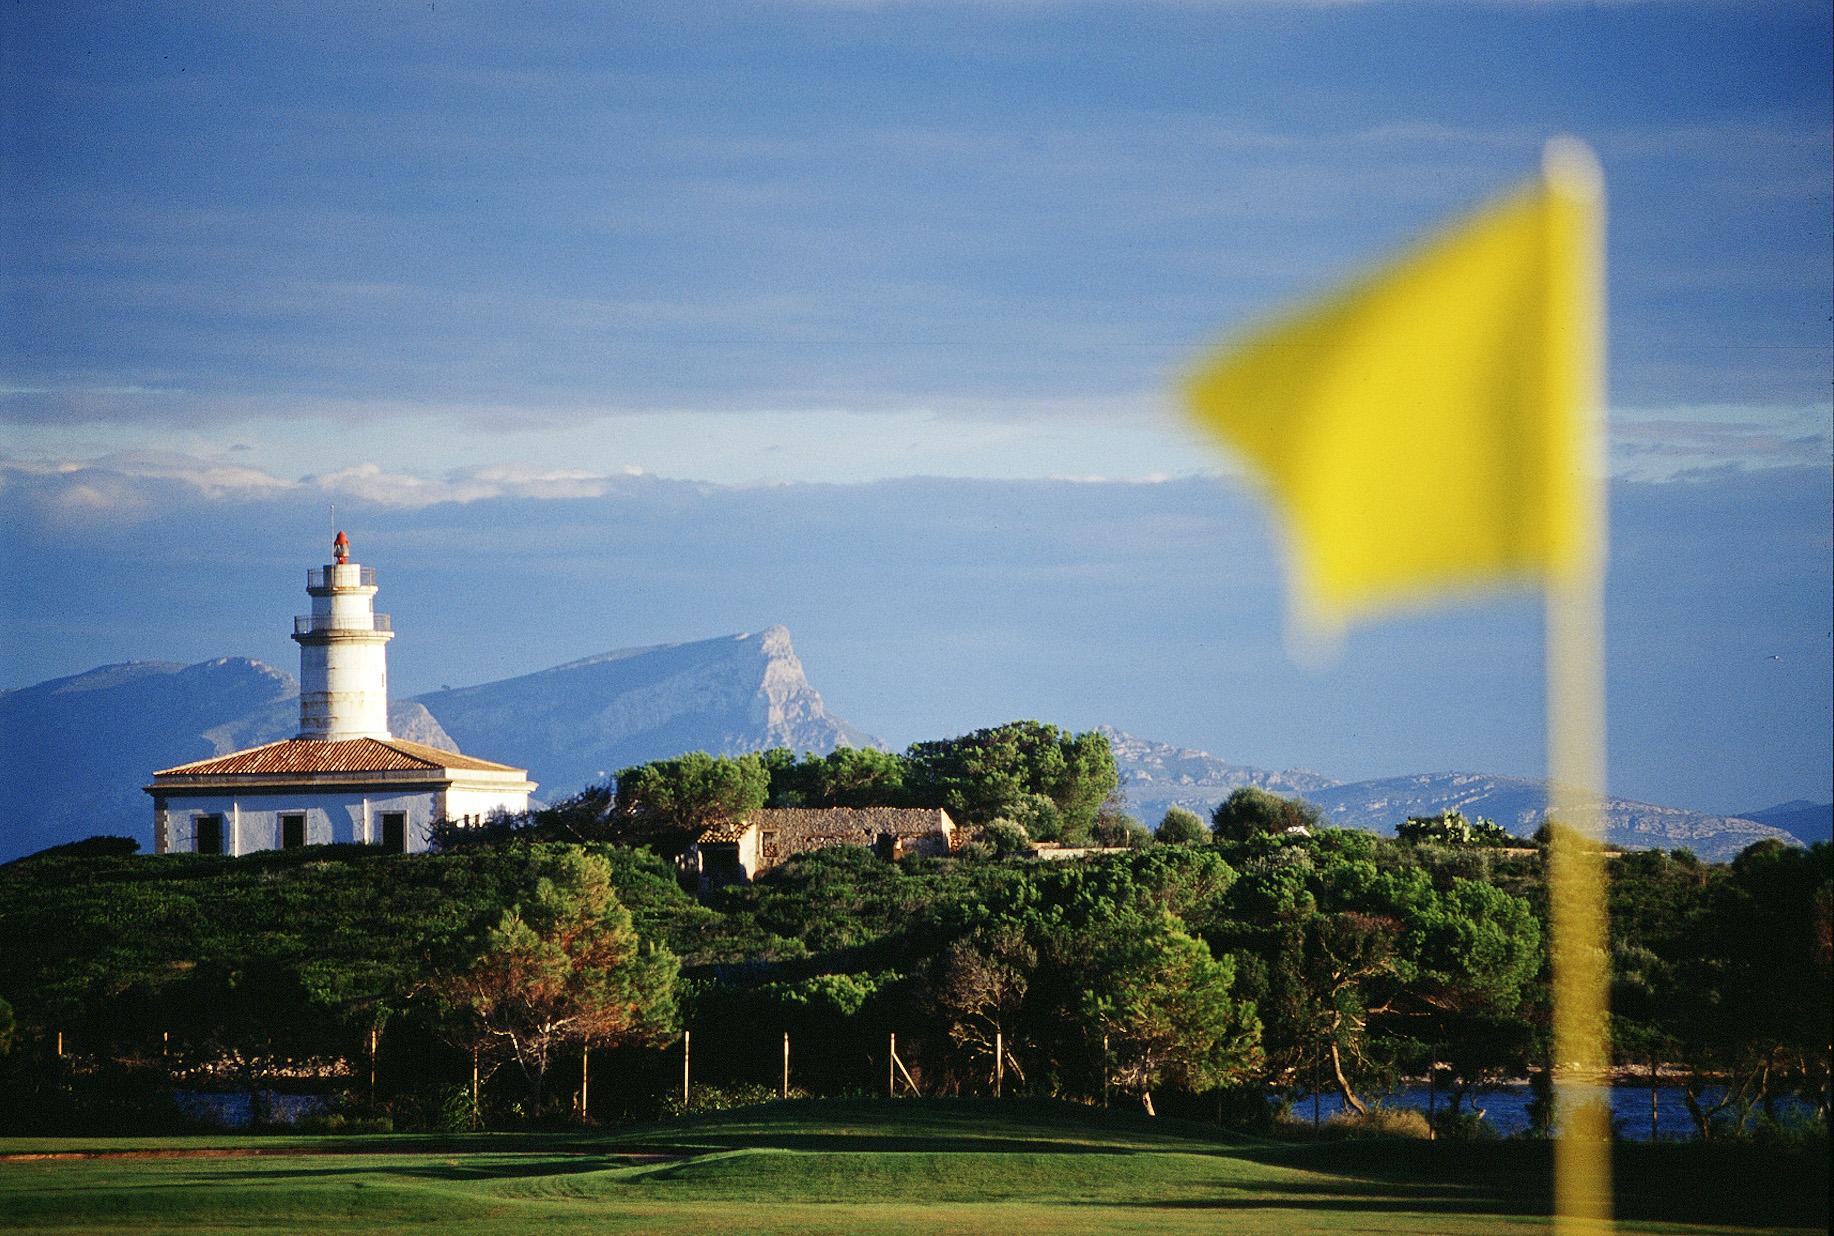 The lighthouse at Alcudia Bay Mallorca